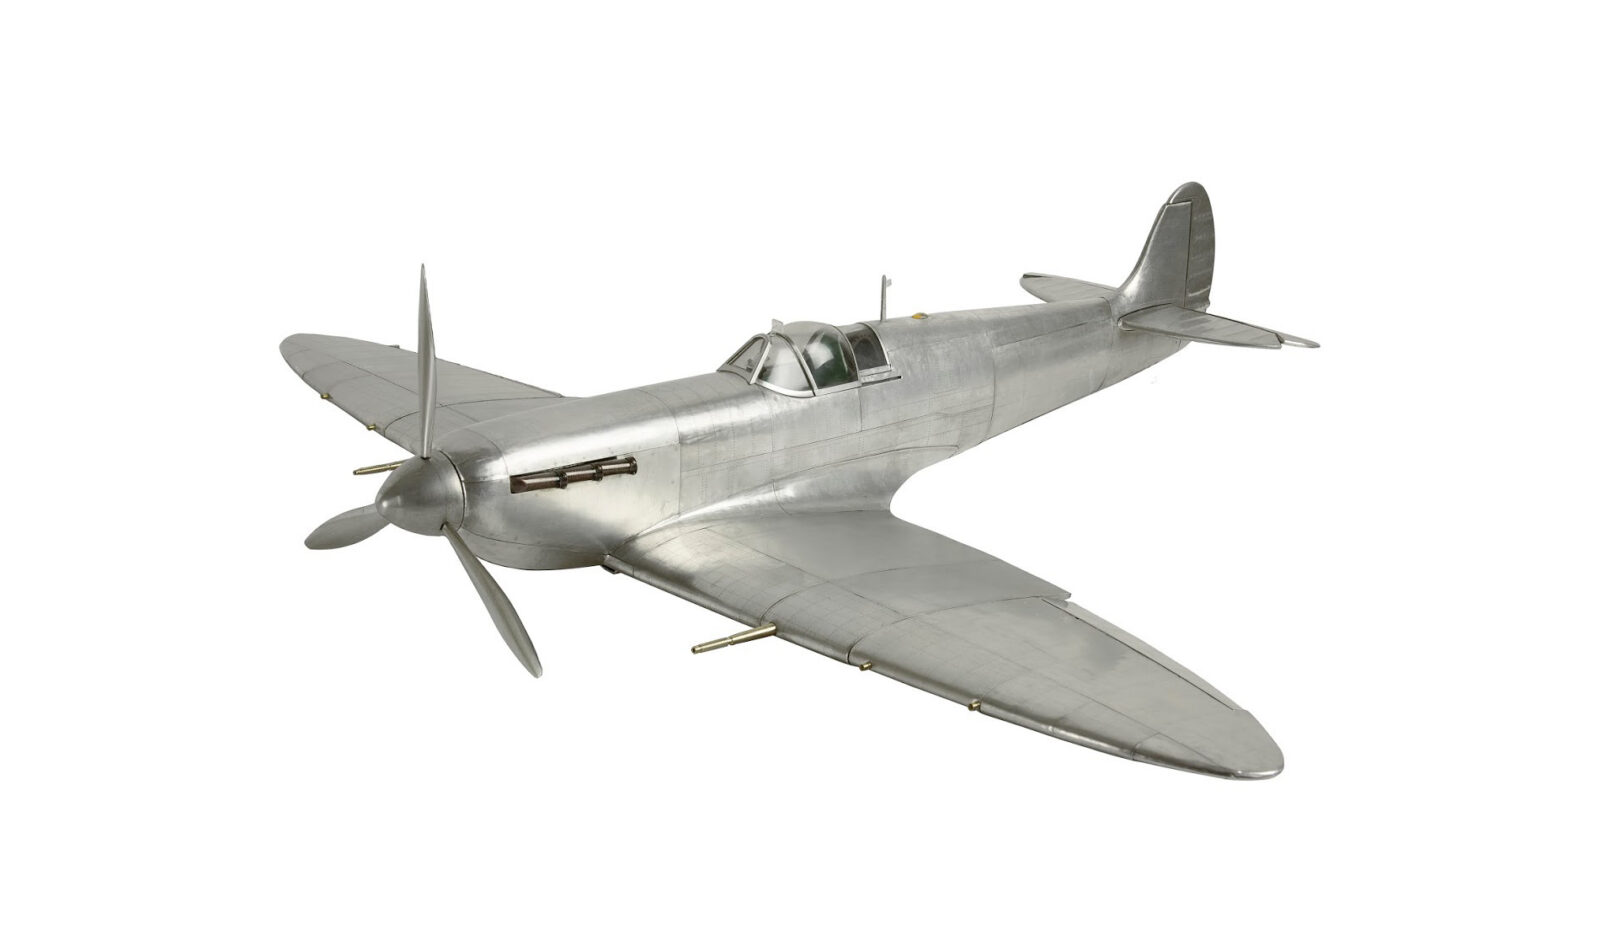 Aluminium Spitfire 1600x950 - Aluminium Spitfire